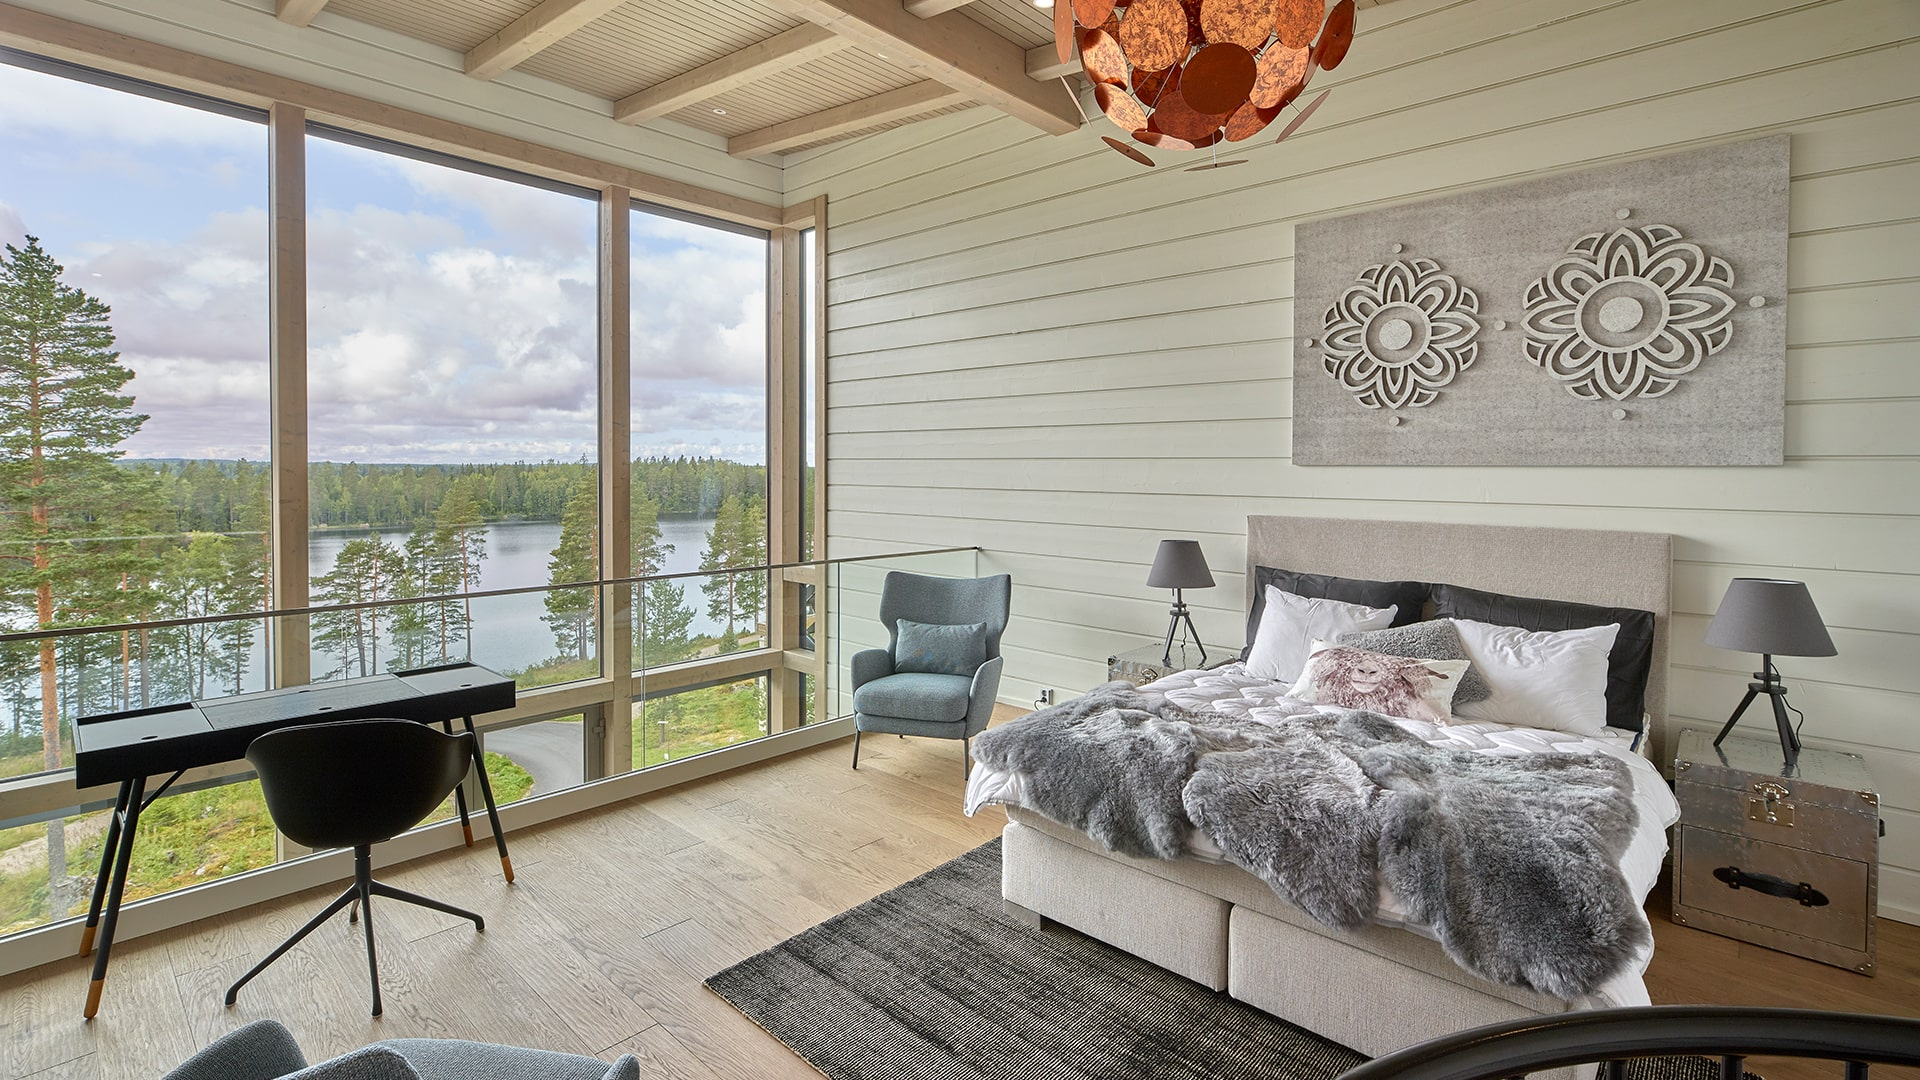 naava-chalet-303-makuuhuone-bedroom-maisema-view